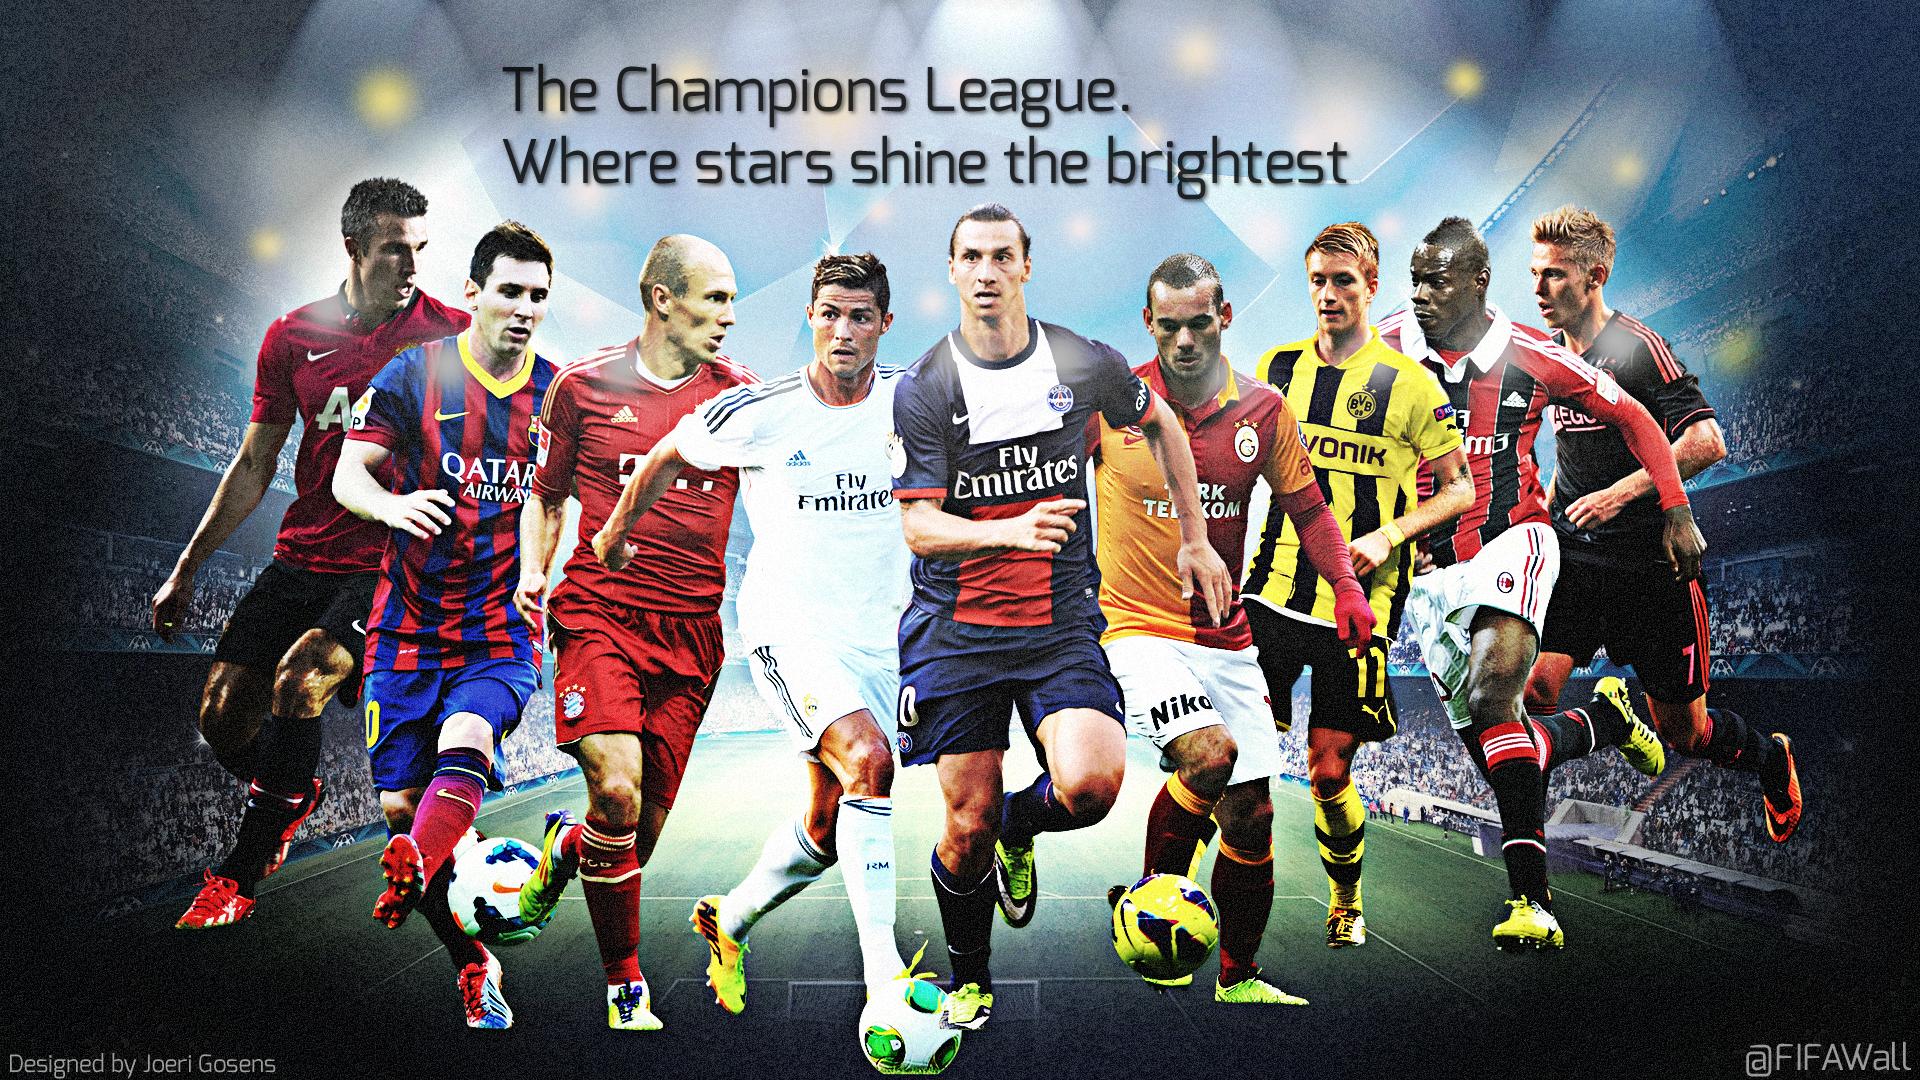 Champions League wallpaper Designed by Joeri Gosens 1920x1080